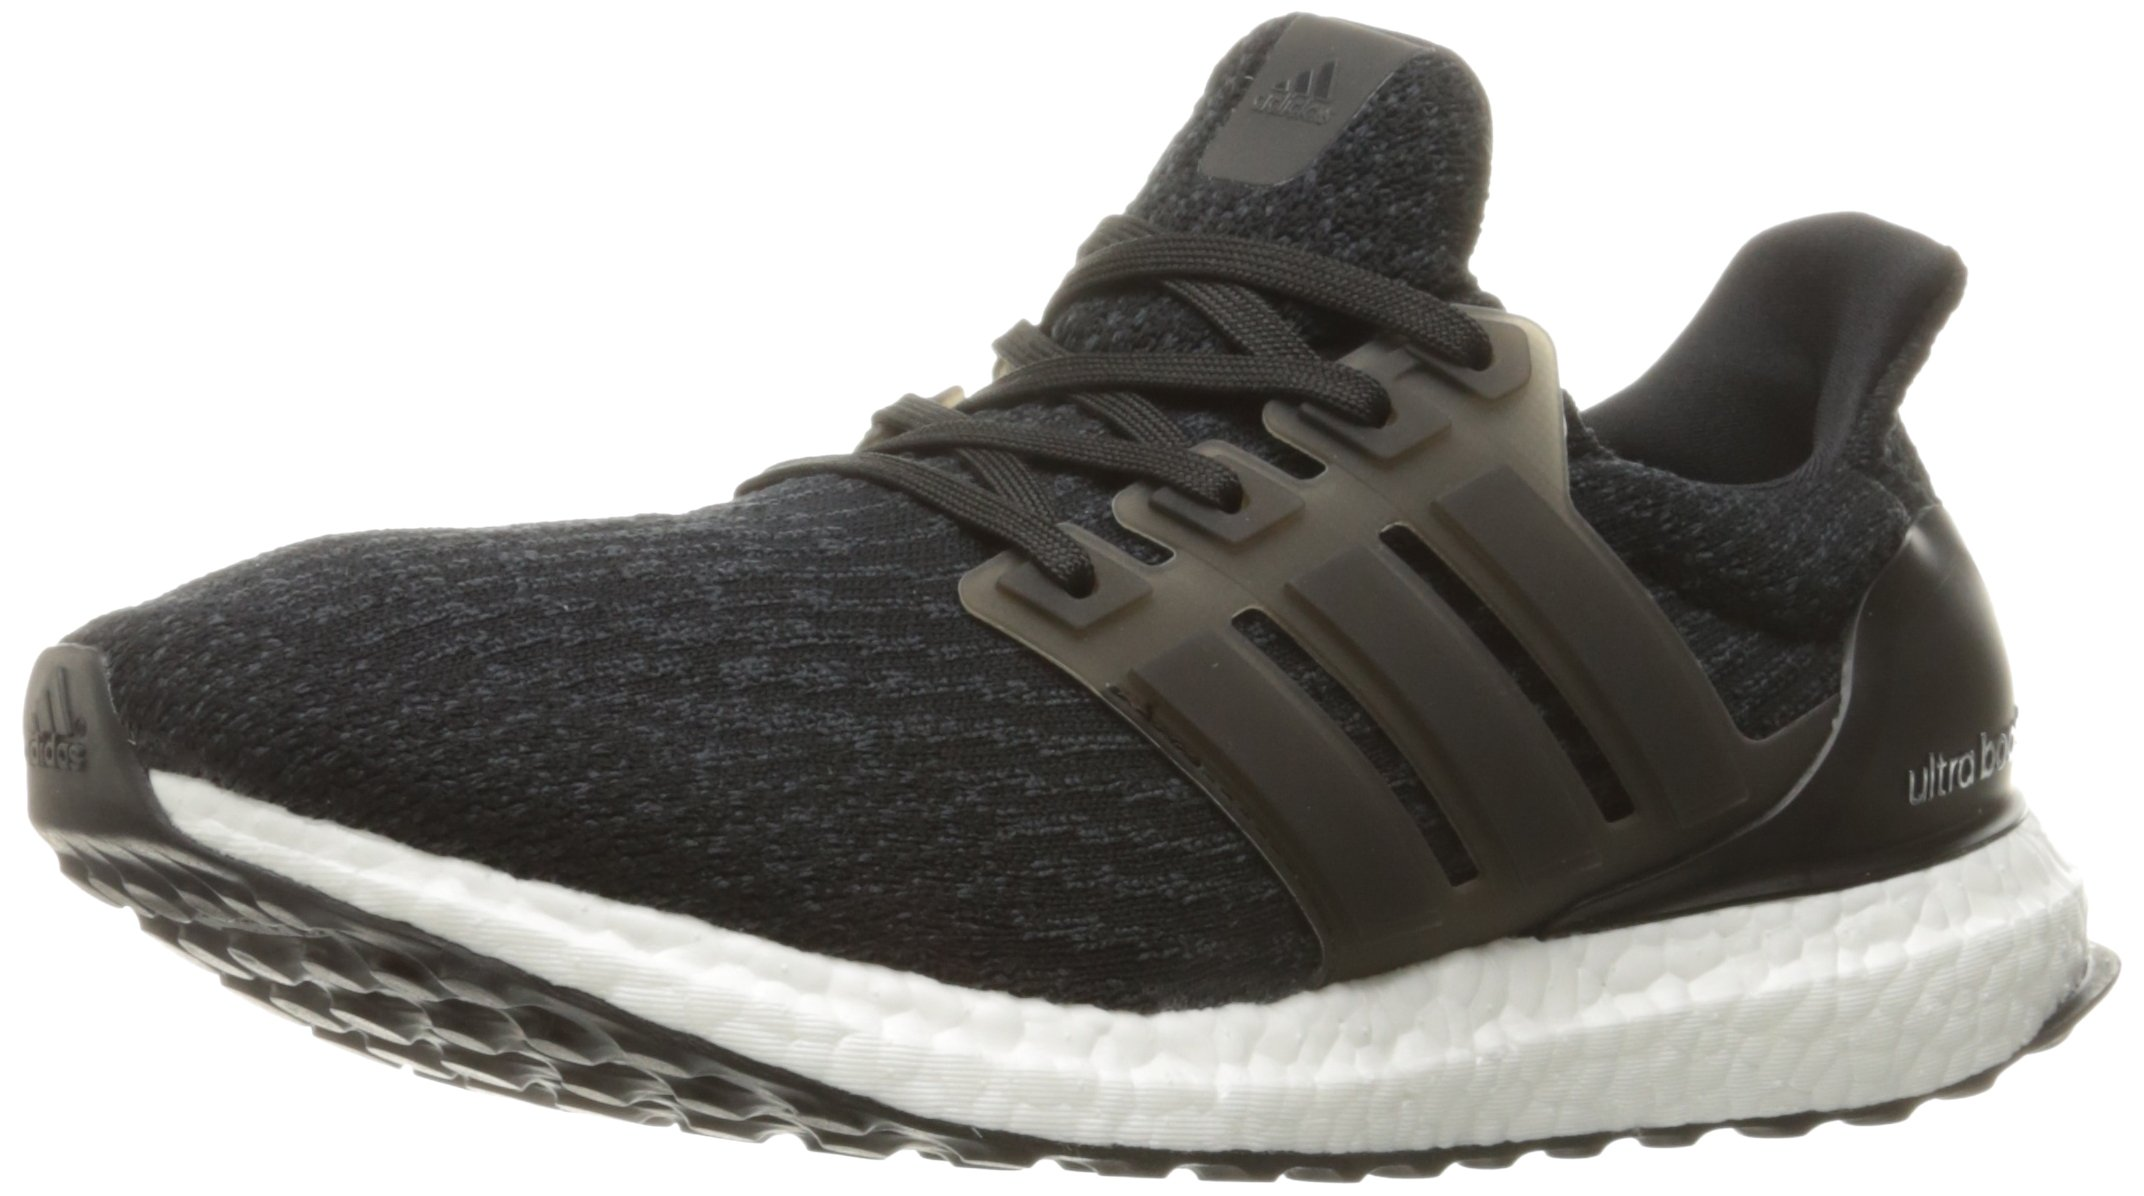 adidas Men's Ultraboost Running Shoe, Black/Dark Grey, 10 M US